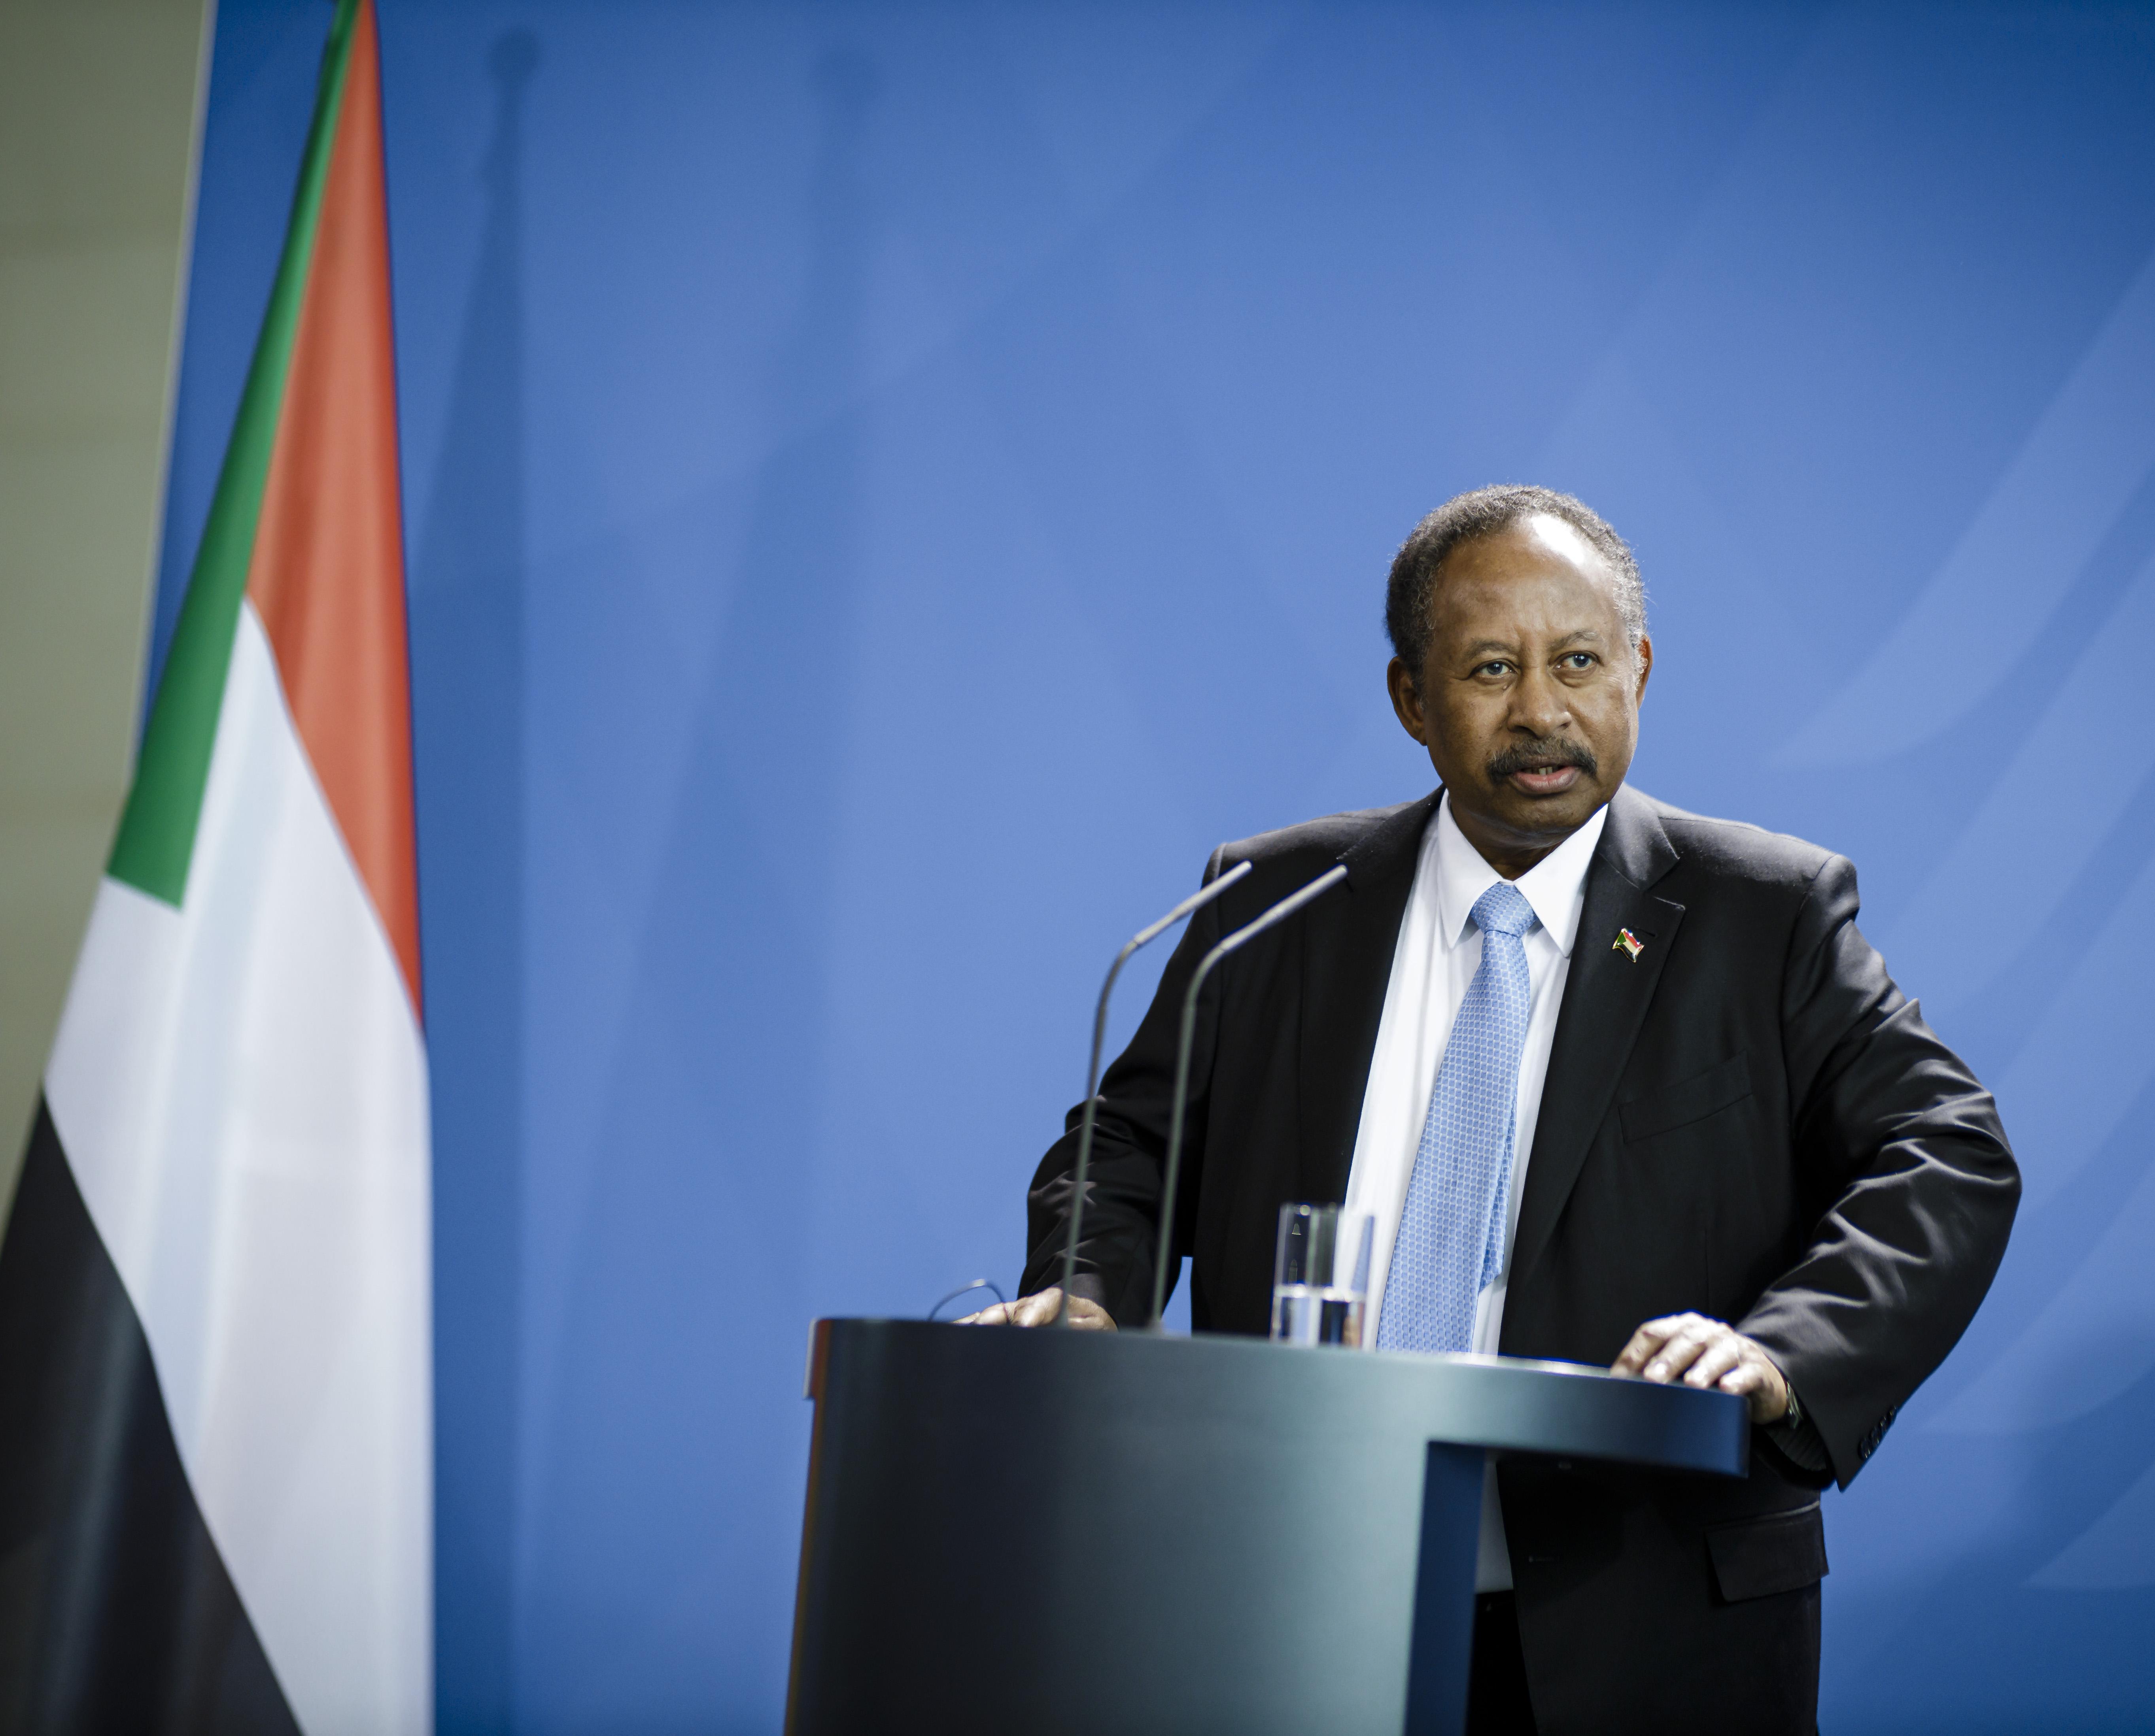 Abdalla Hamdok, Prime Minister of Sudan, at Bundeskanzleramt on Feb. 14, 2020 in Berlin, Germany.